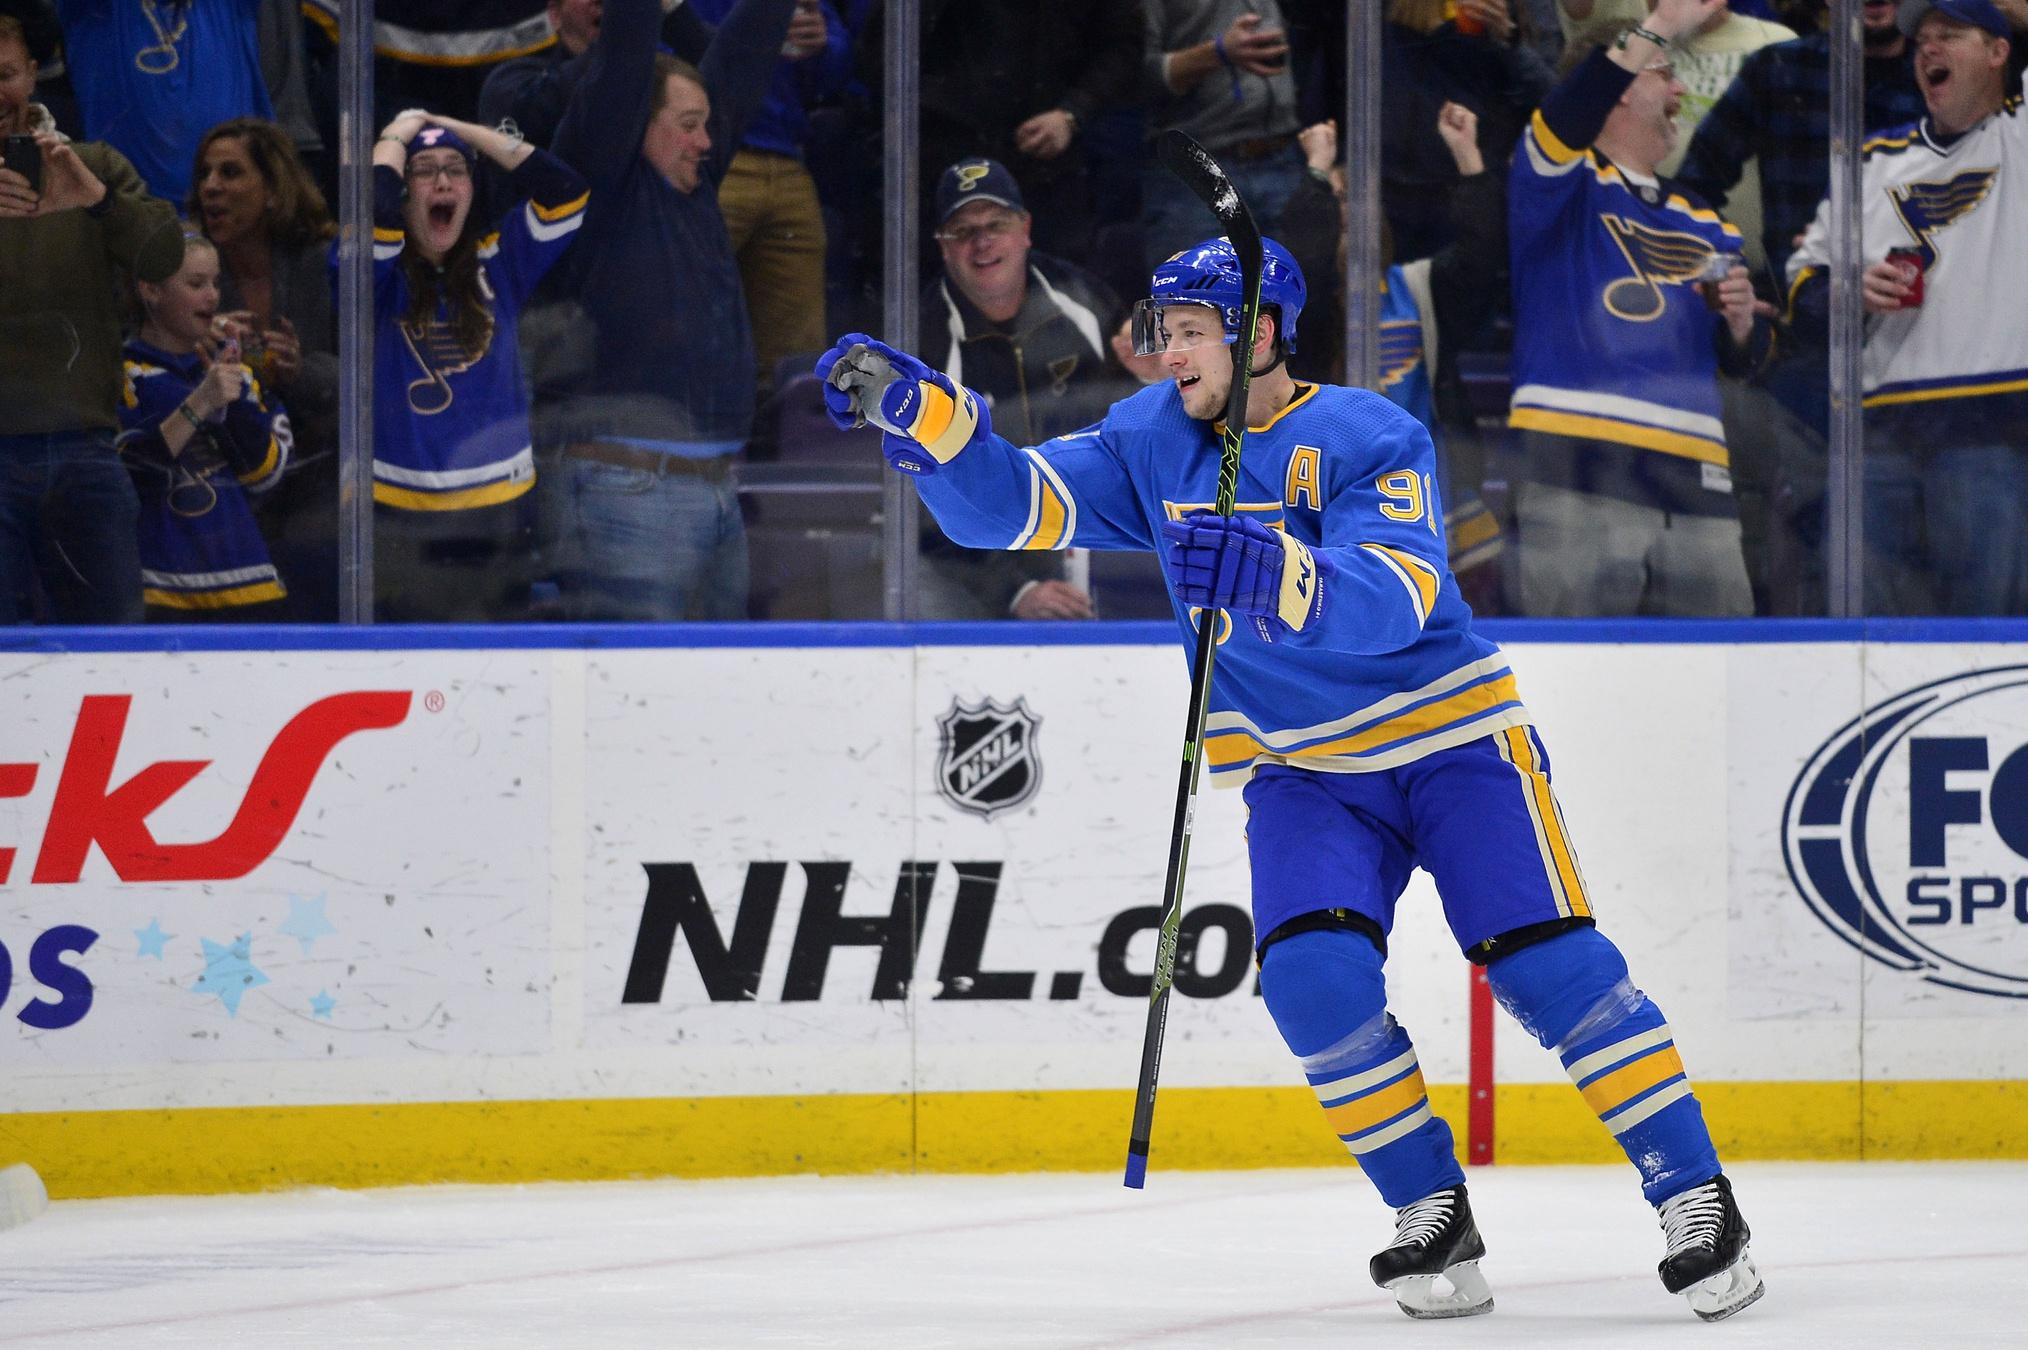 Tarasenko hits 30+ goals for the fifth consecutive season